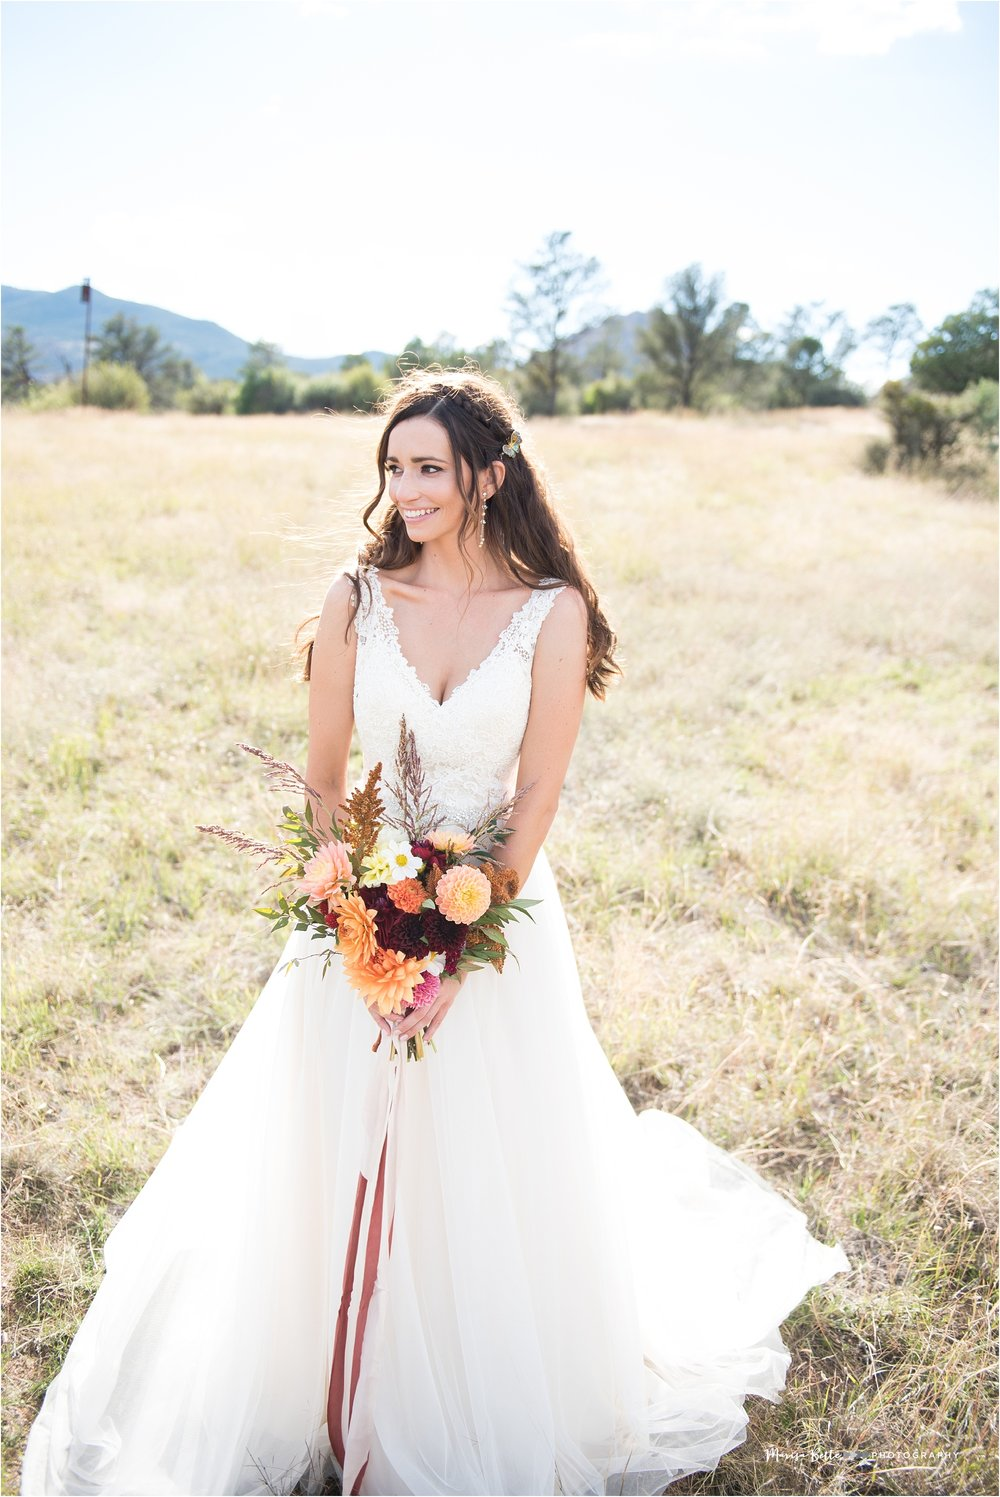 Arizona | Phoenix Wedding Photographer | www.marisabellephotography.com-104.jpg